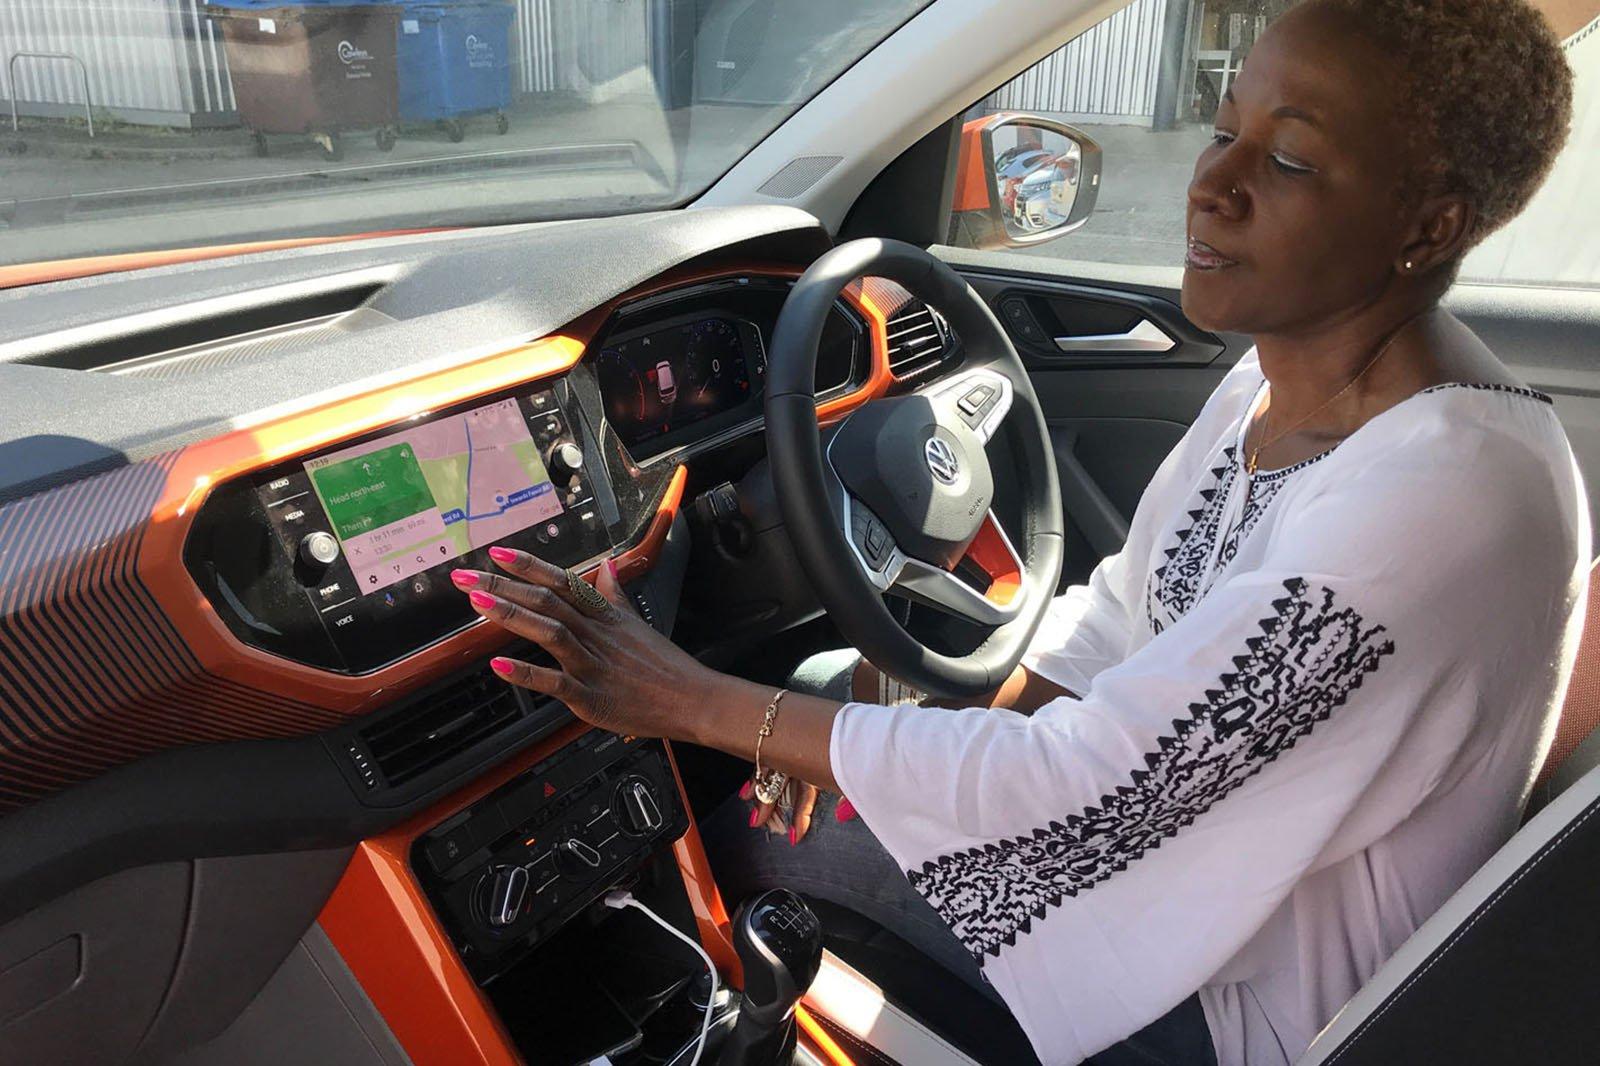 2020 Volkswagen T-Cross long termer - Millie using the infotainment